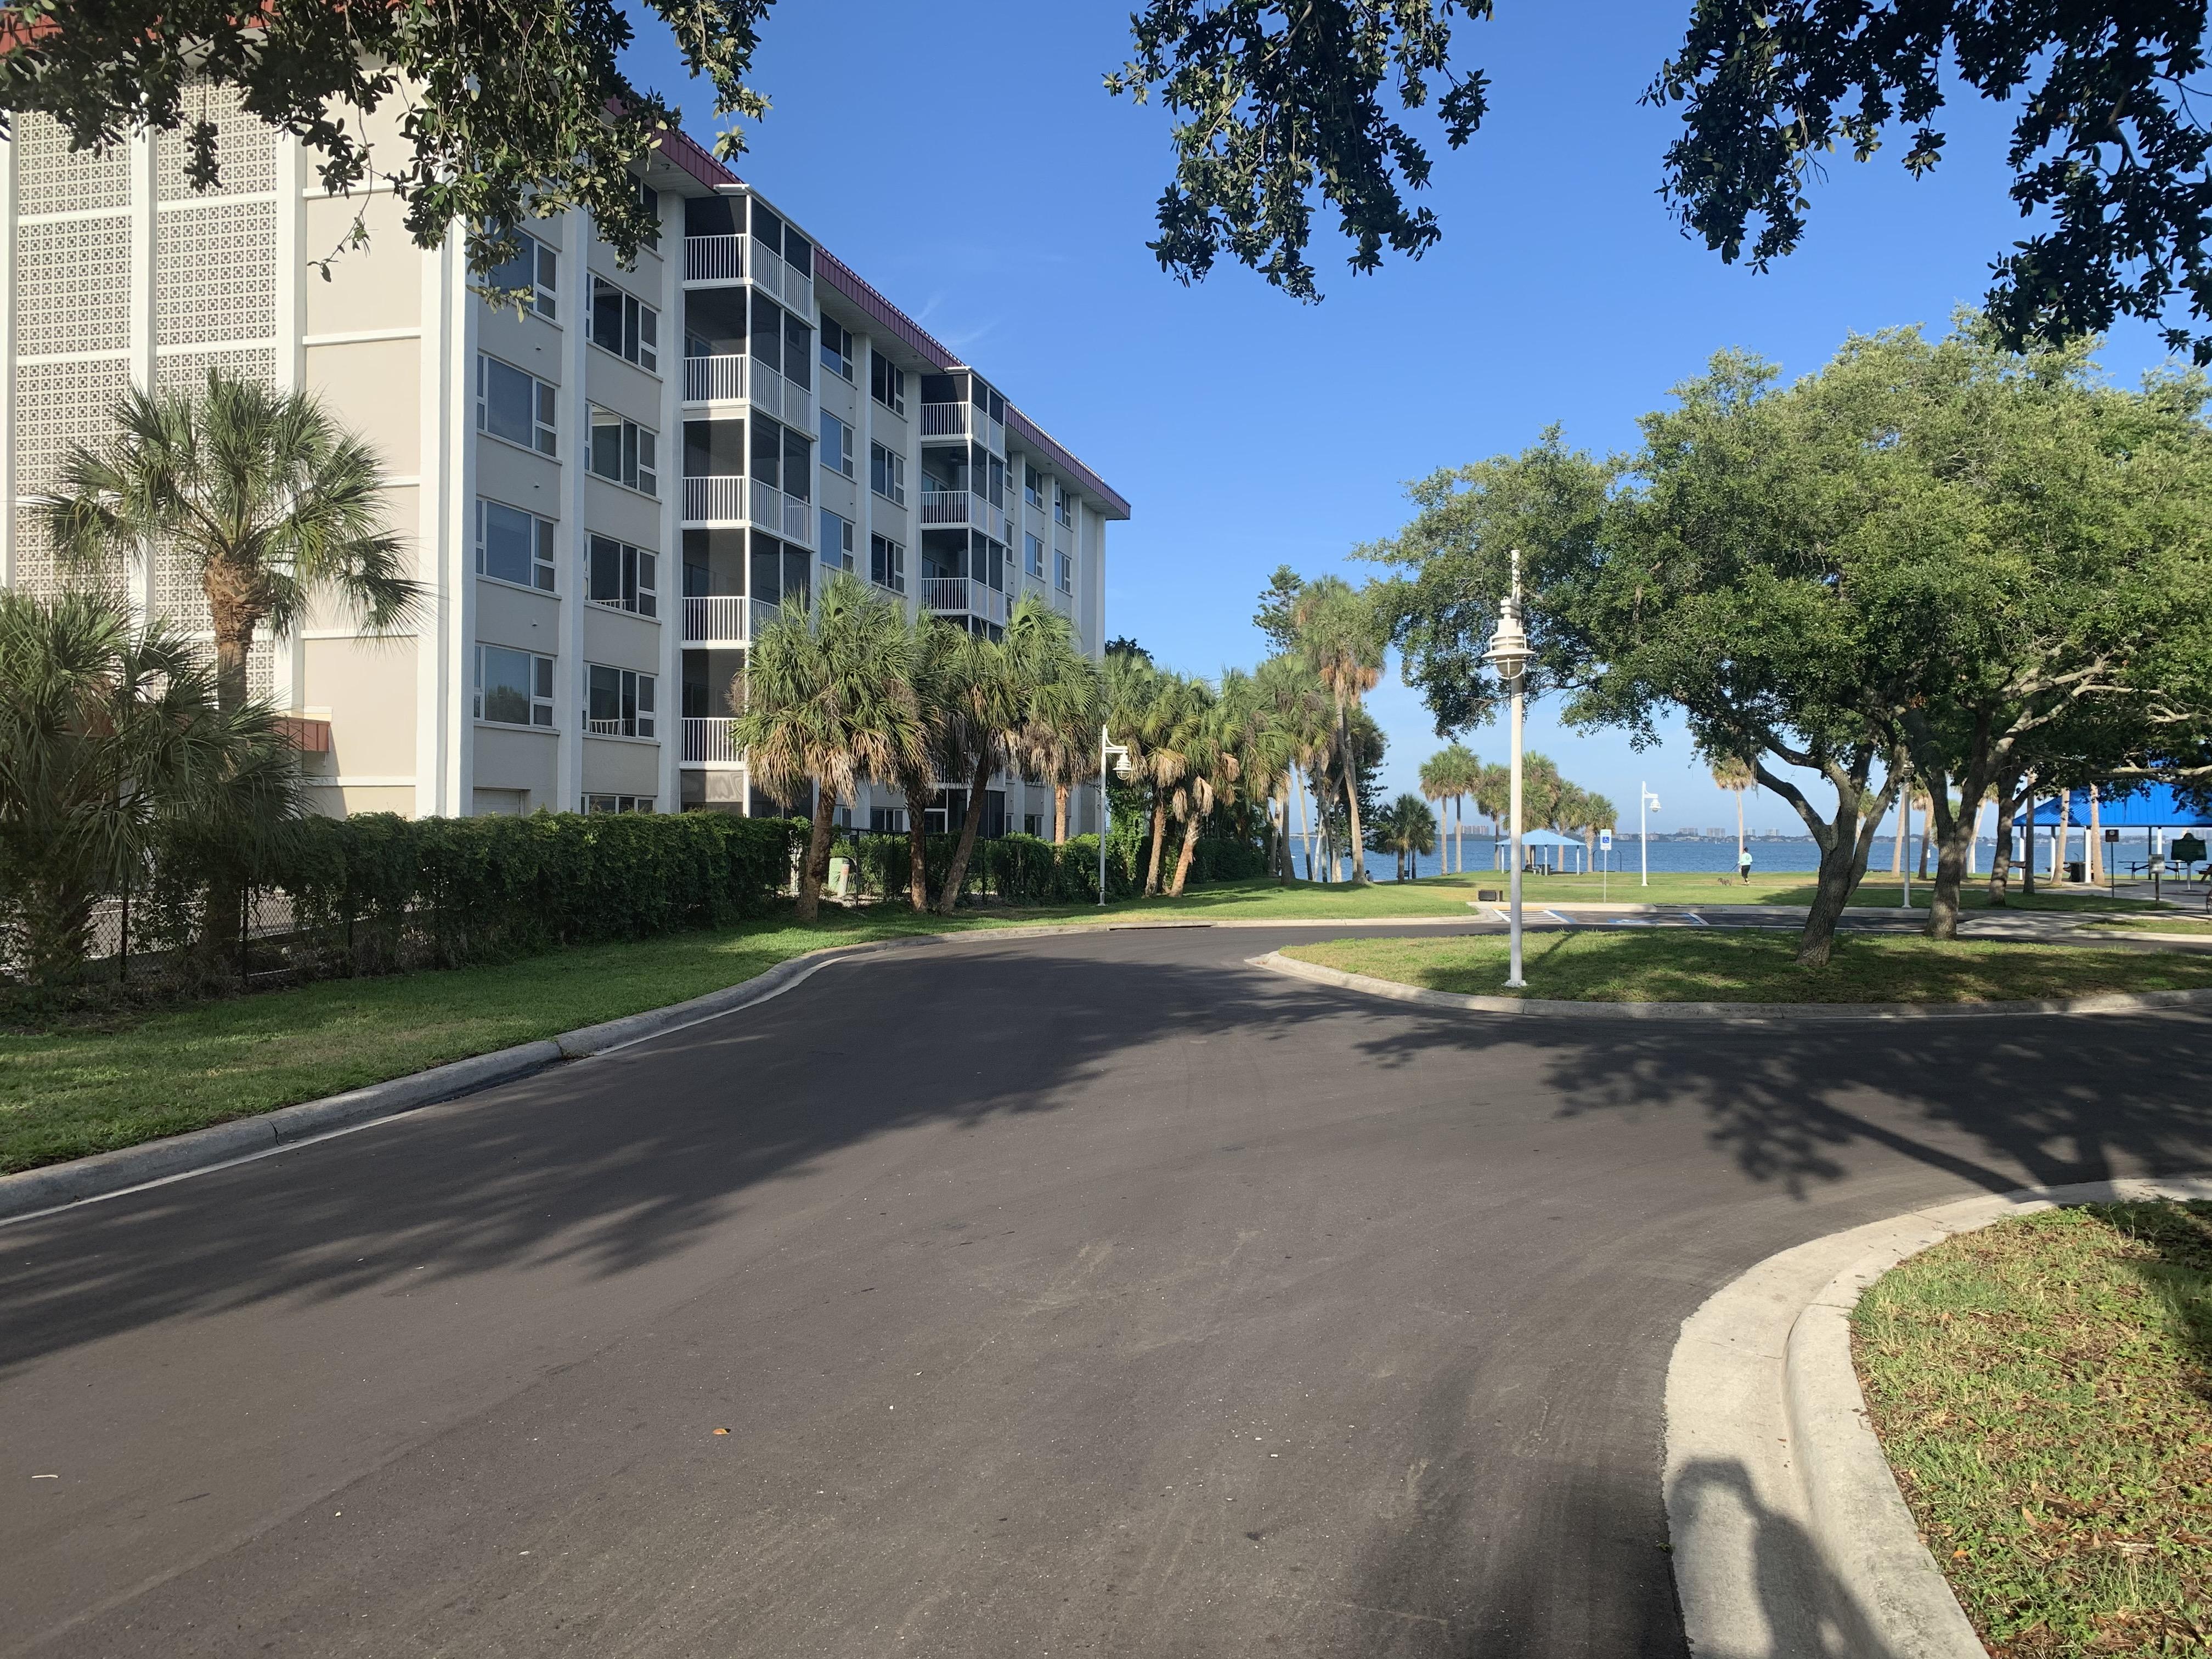 Bays Bluff Condo in Downtown Sarasota